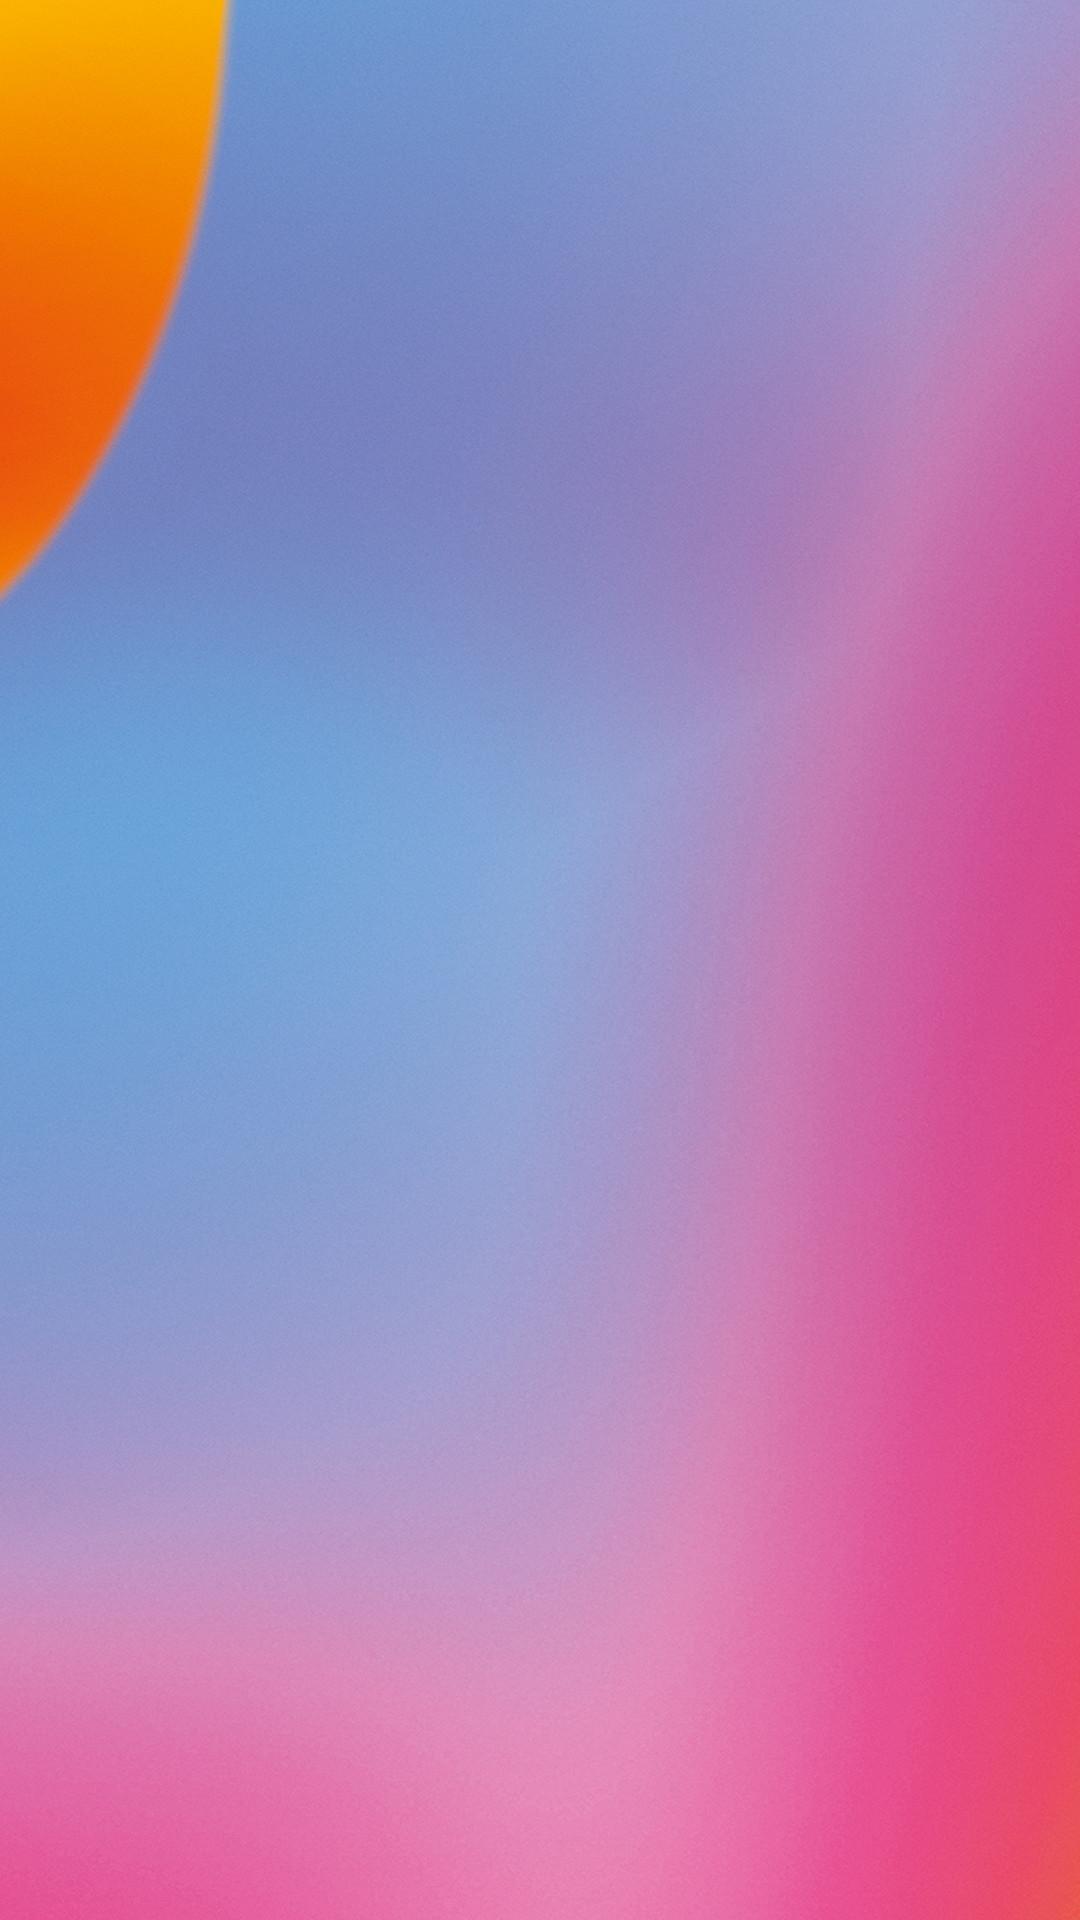 Lenovo Wallpaper theme (75+ images)